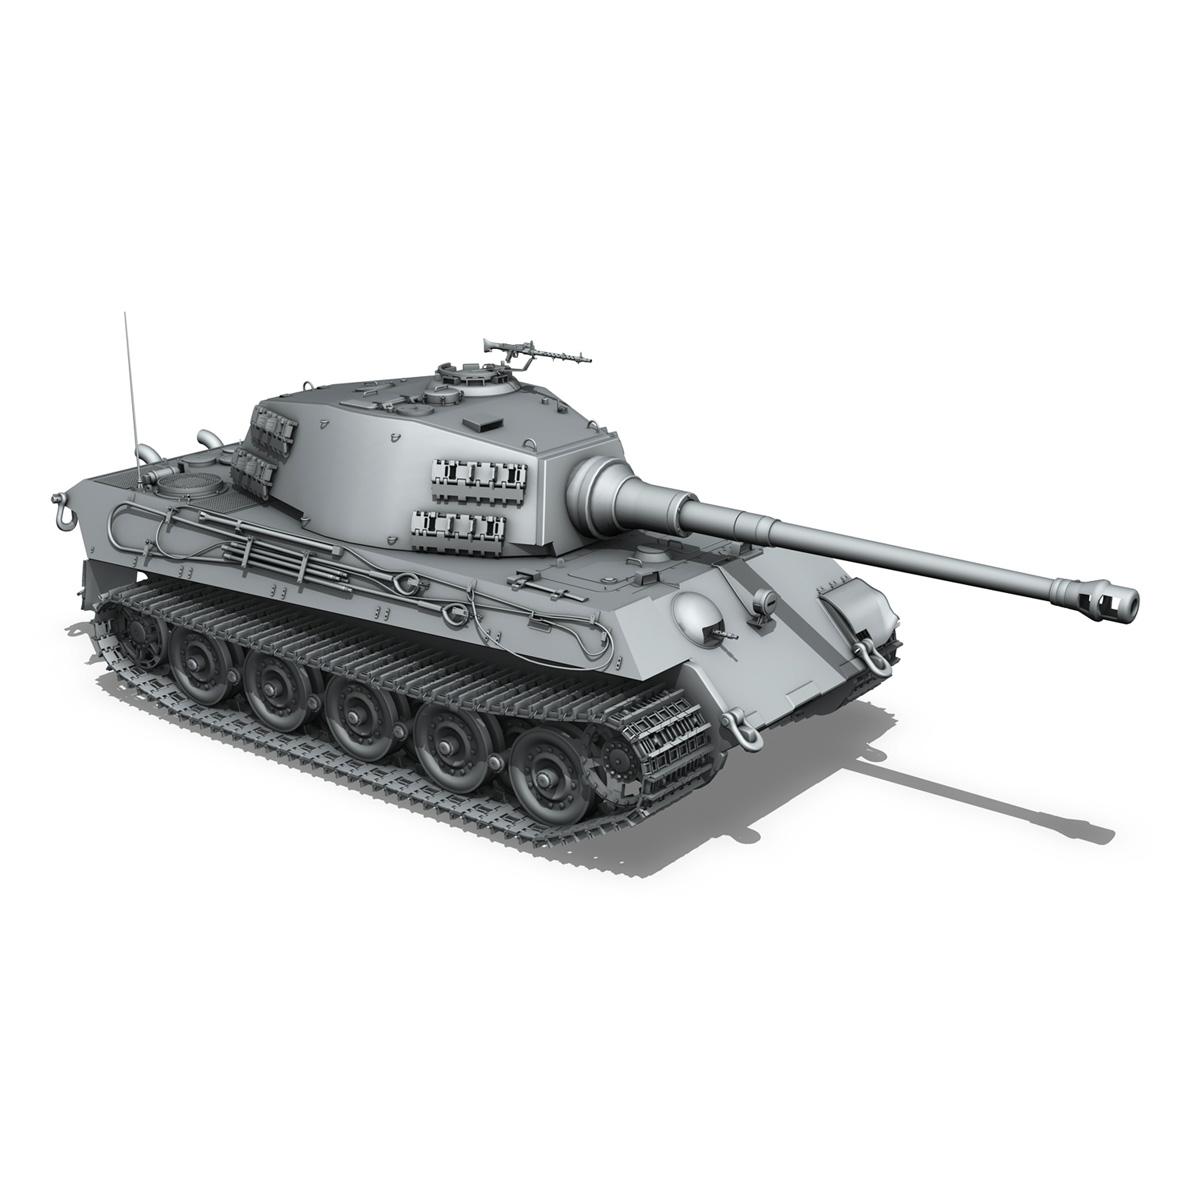 panzerkampfwagen vi – ausf b – tiger ii – 201 3d model 3ds c4d lwo lw lws obj 293312